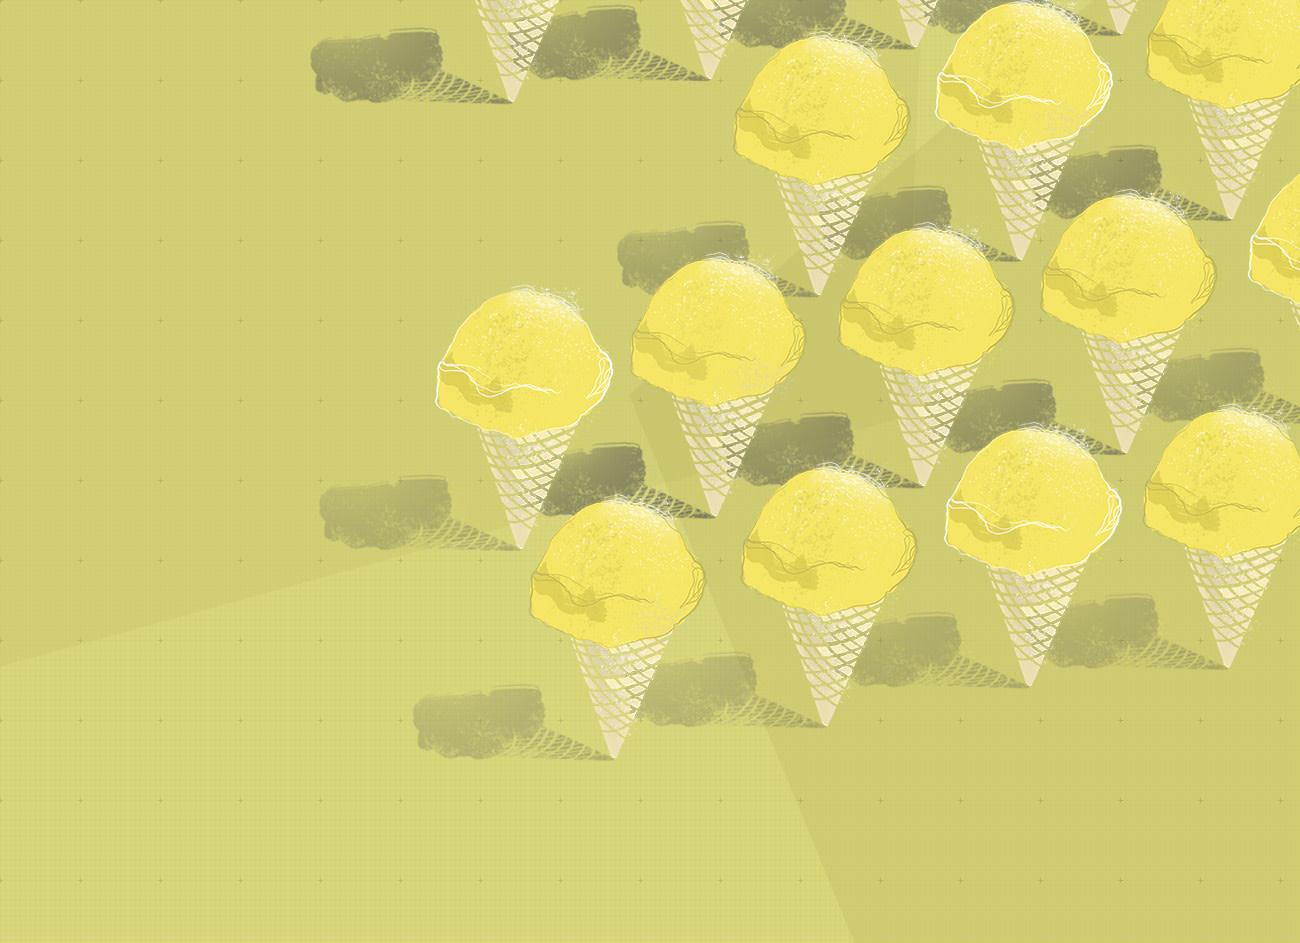 slice-gelato-bkgd